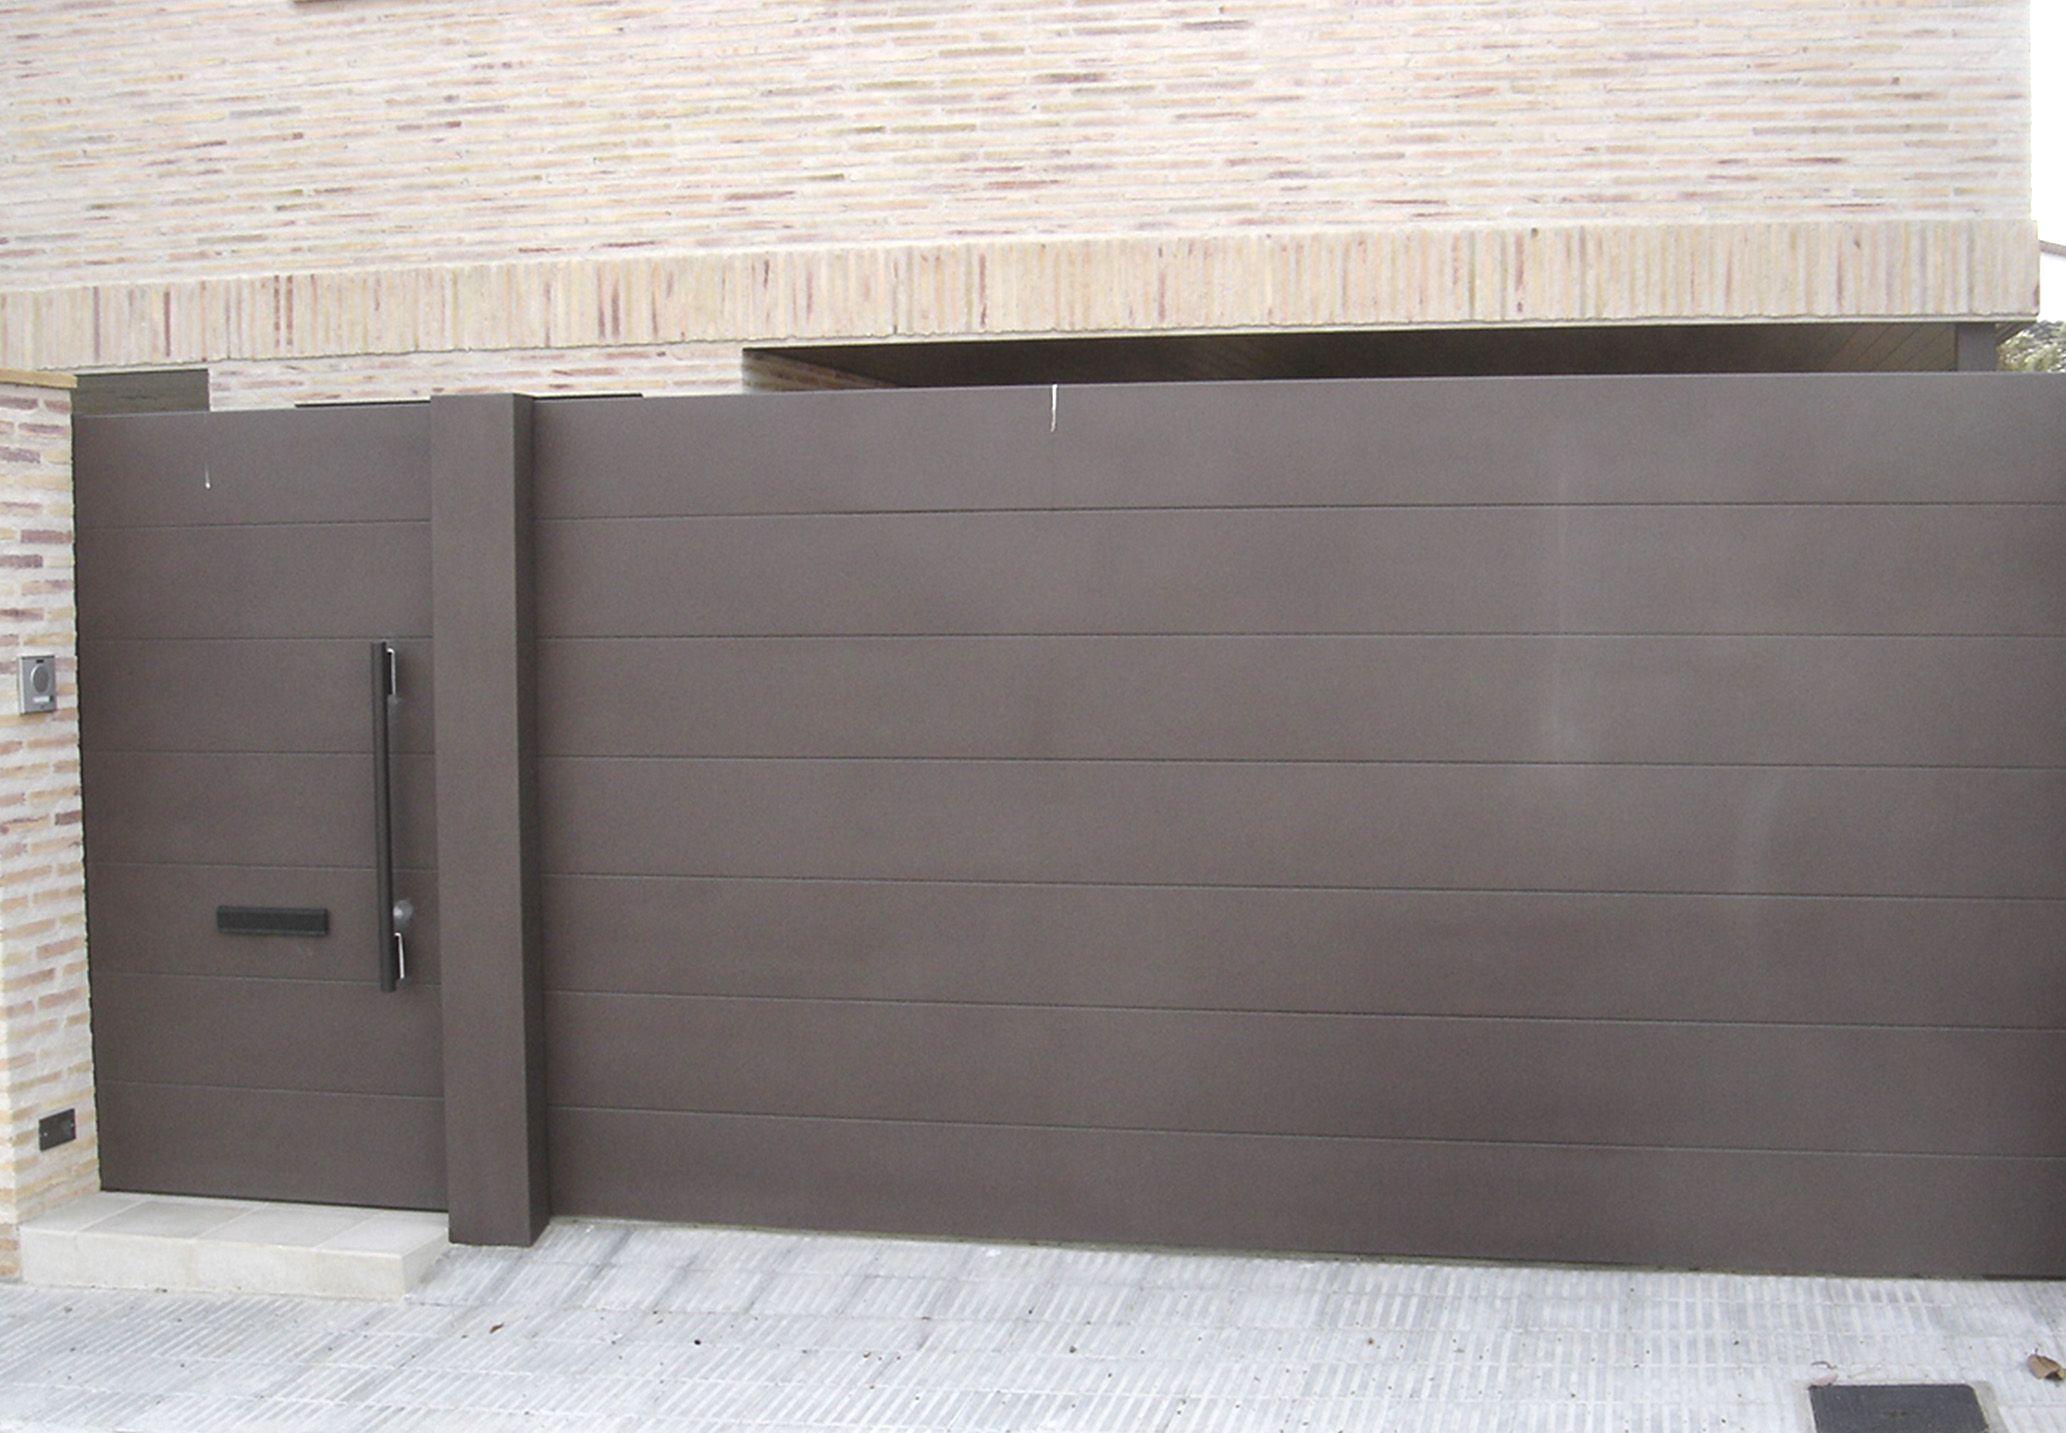 Puerta valla dise o buscar con google vallados - Puertas de valla ...